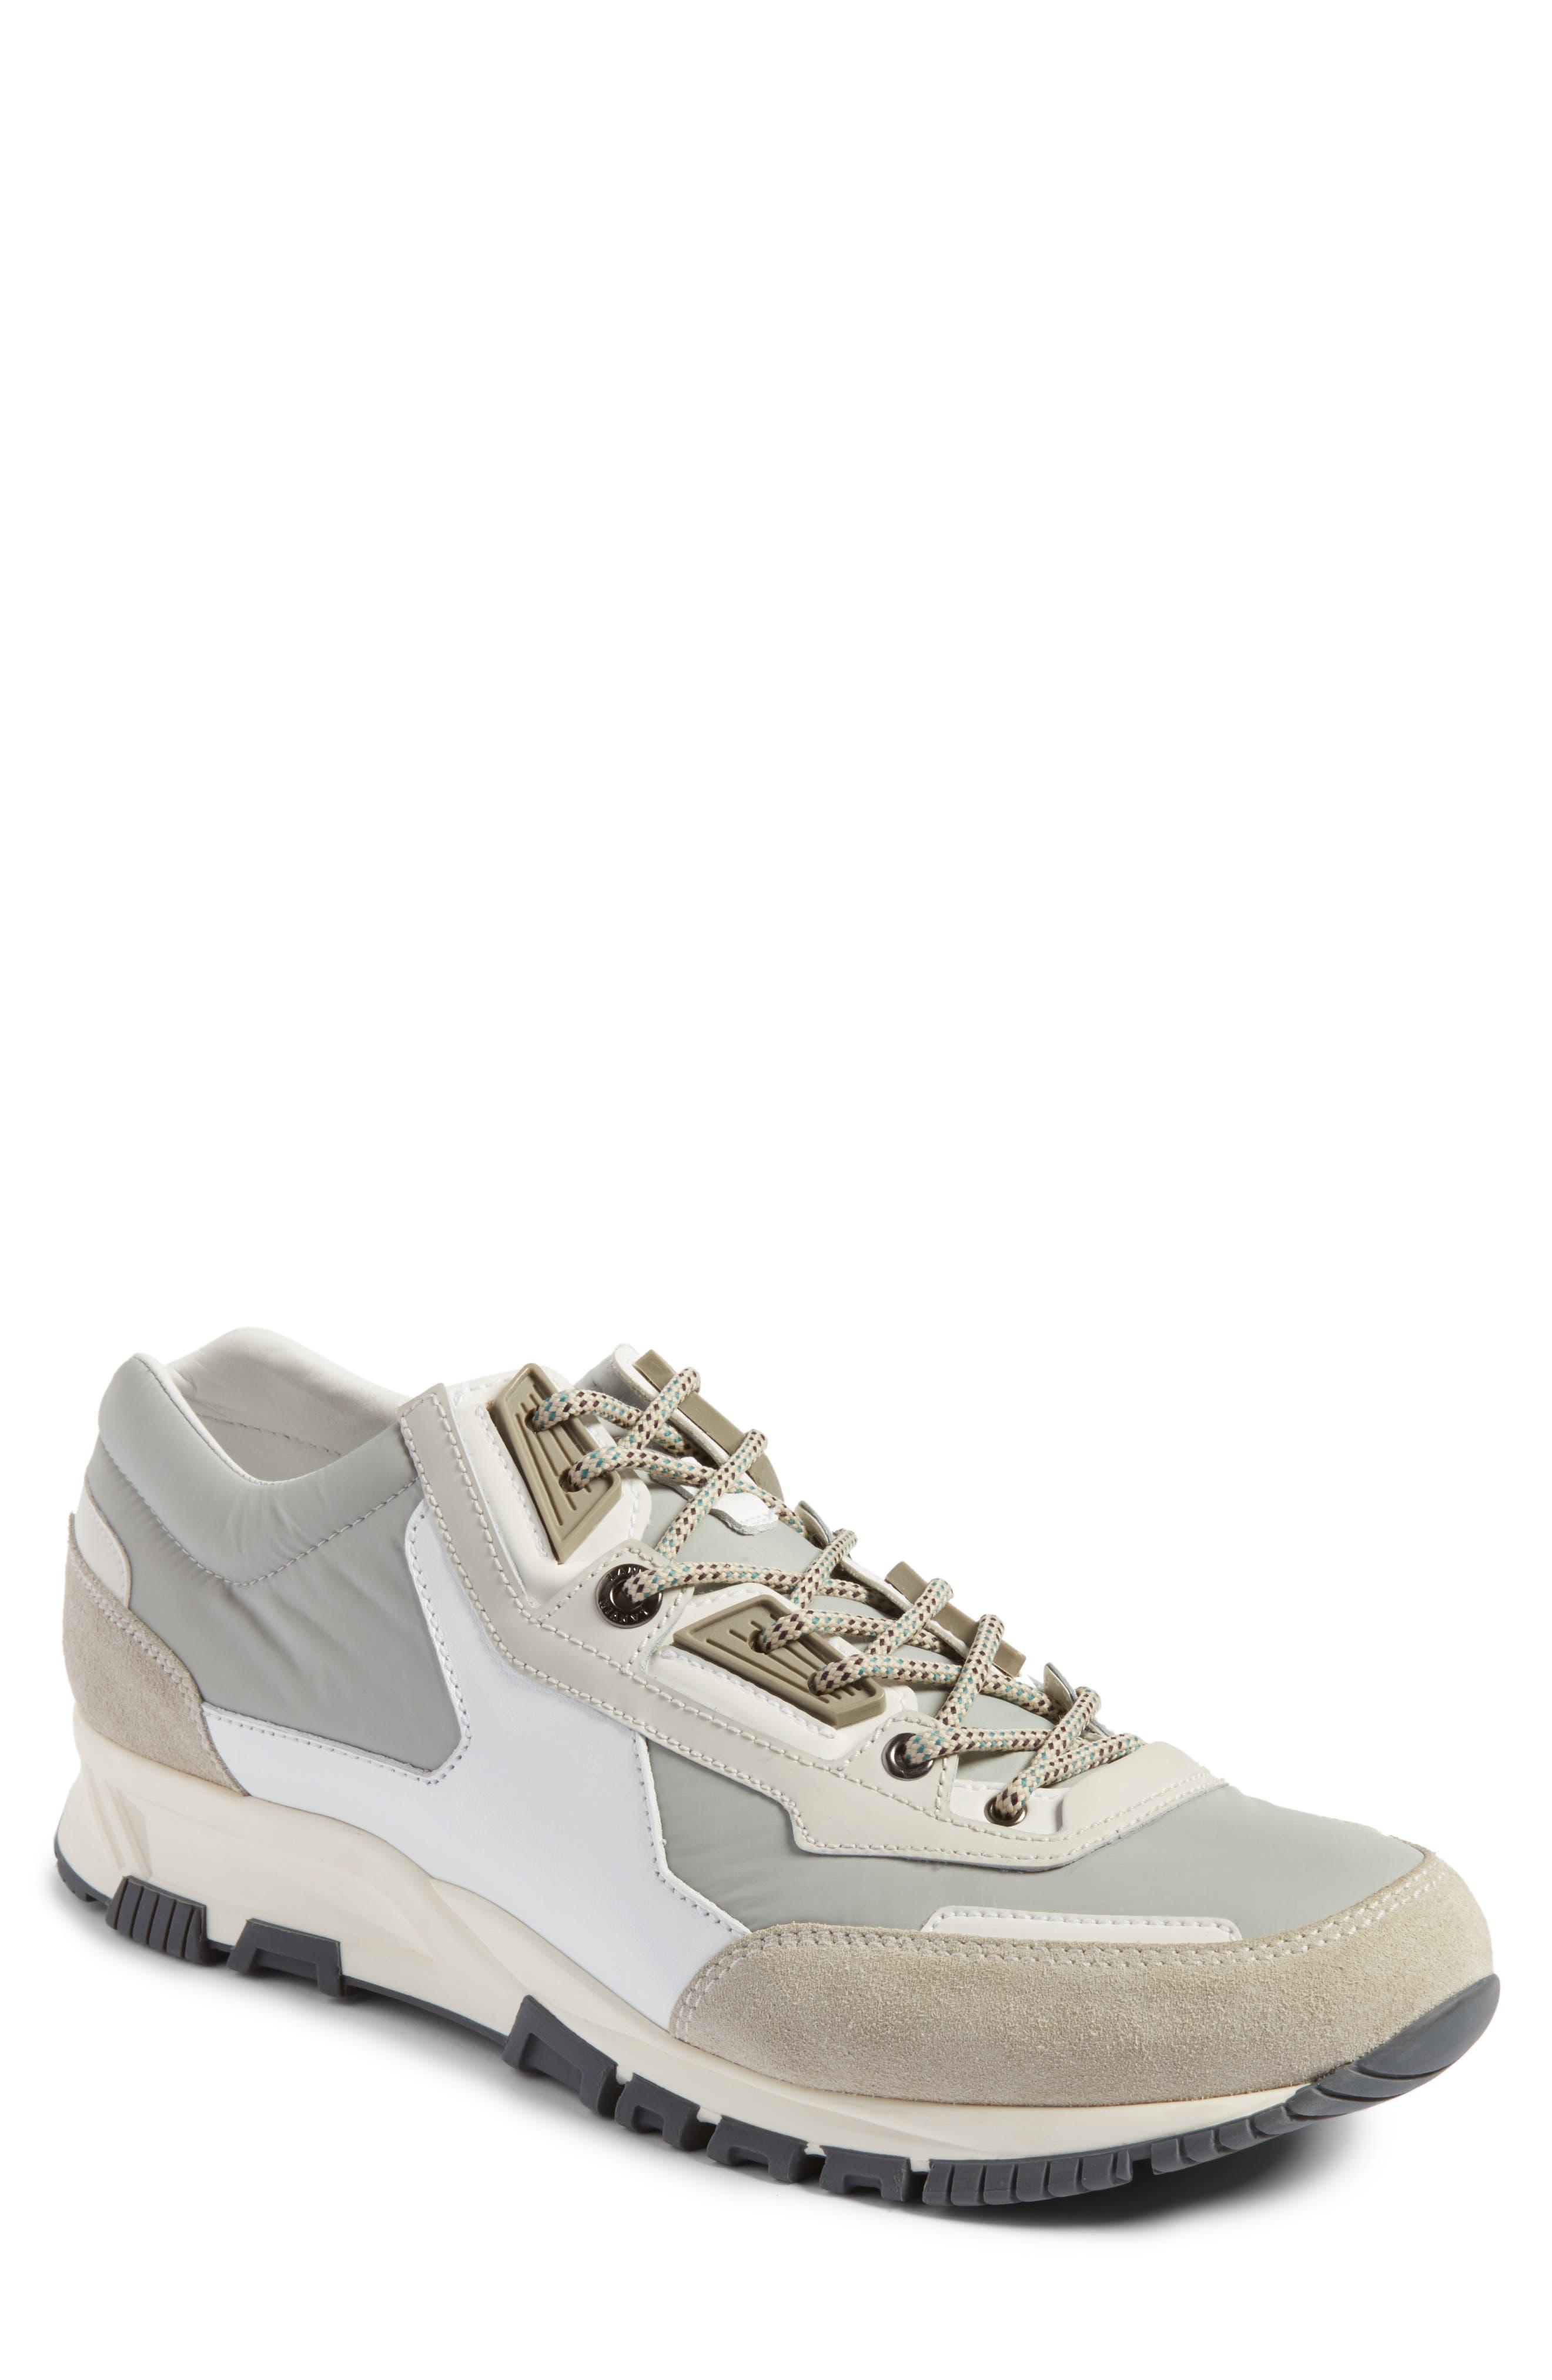 Running Sneaker,                             Main thumbnail 1, color,                             252